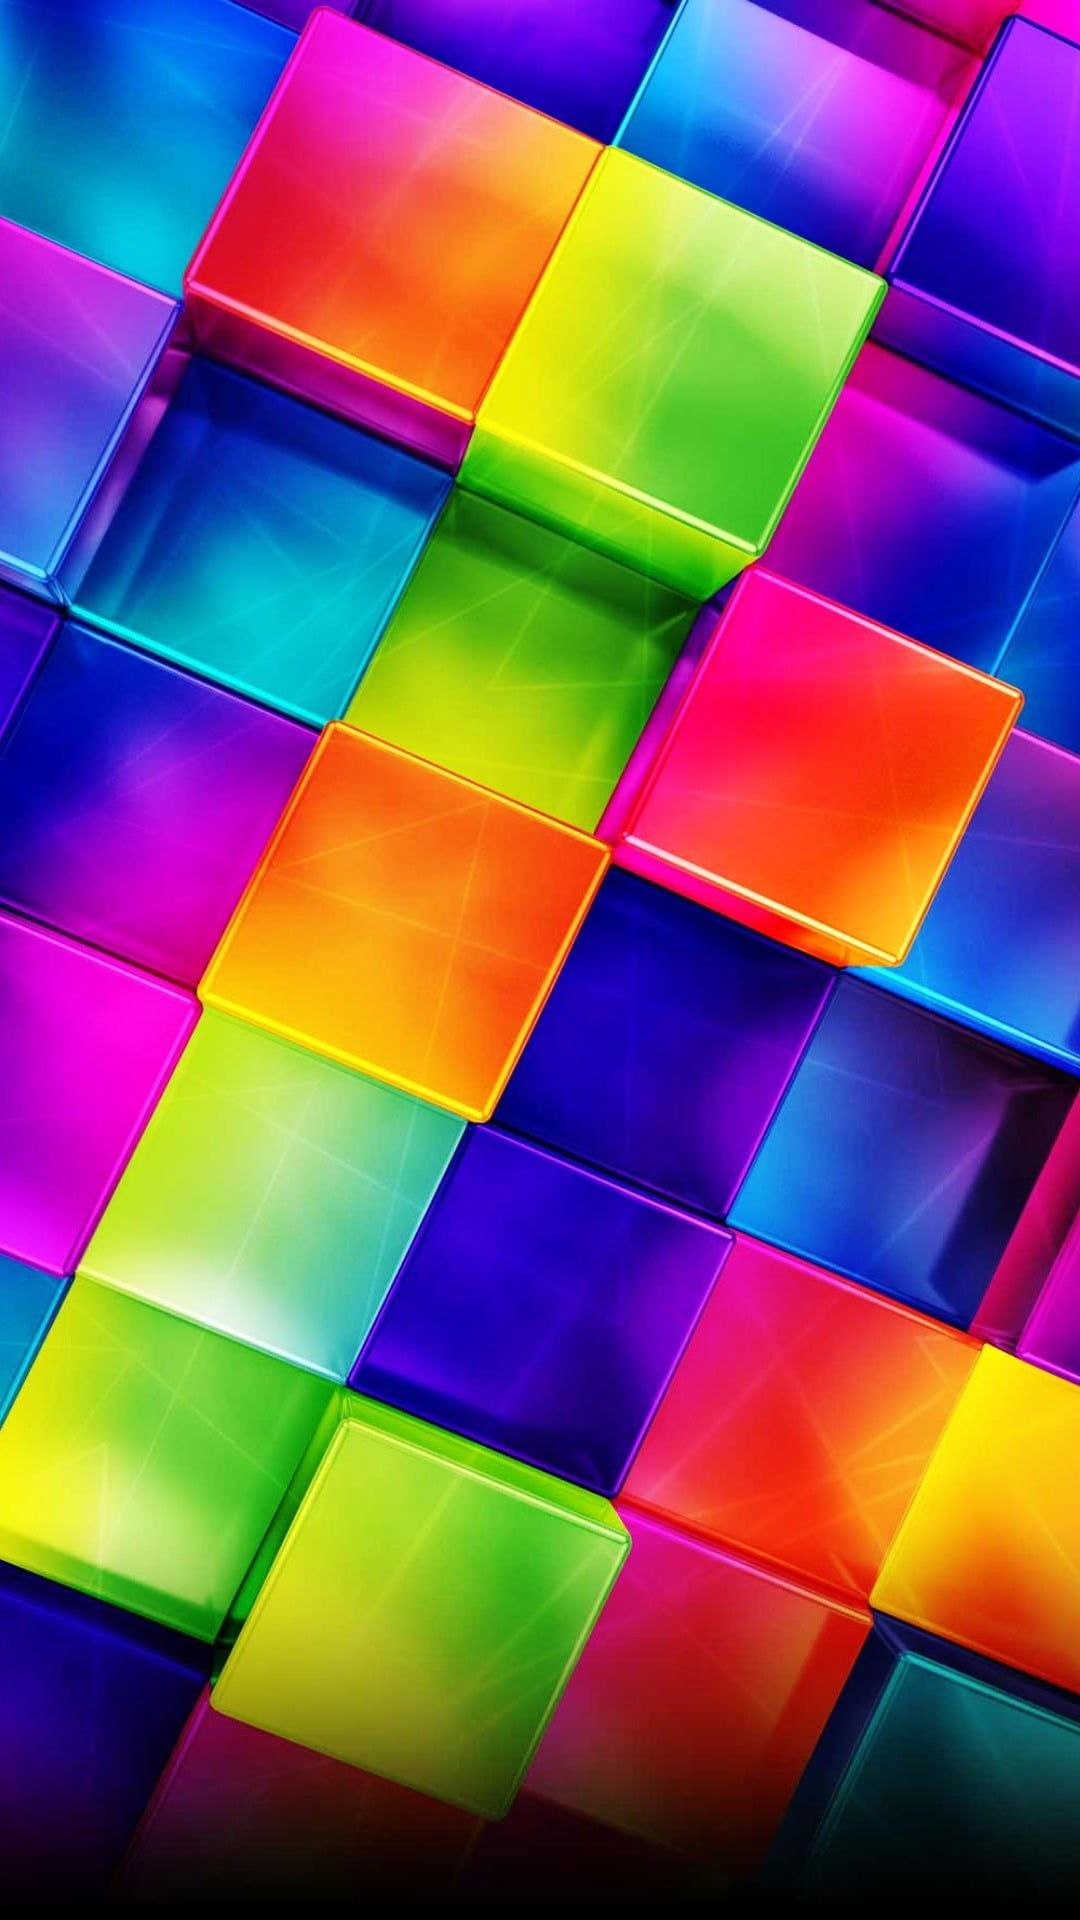 3d Colorful Geometric Multicolored Blocks Digital Wallpaper 3d Abstract 3d White T Geometric Colourful Wallpaper Geometric Wallpaper Iphone Digital Wallpaper